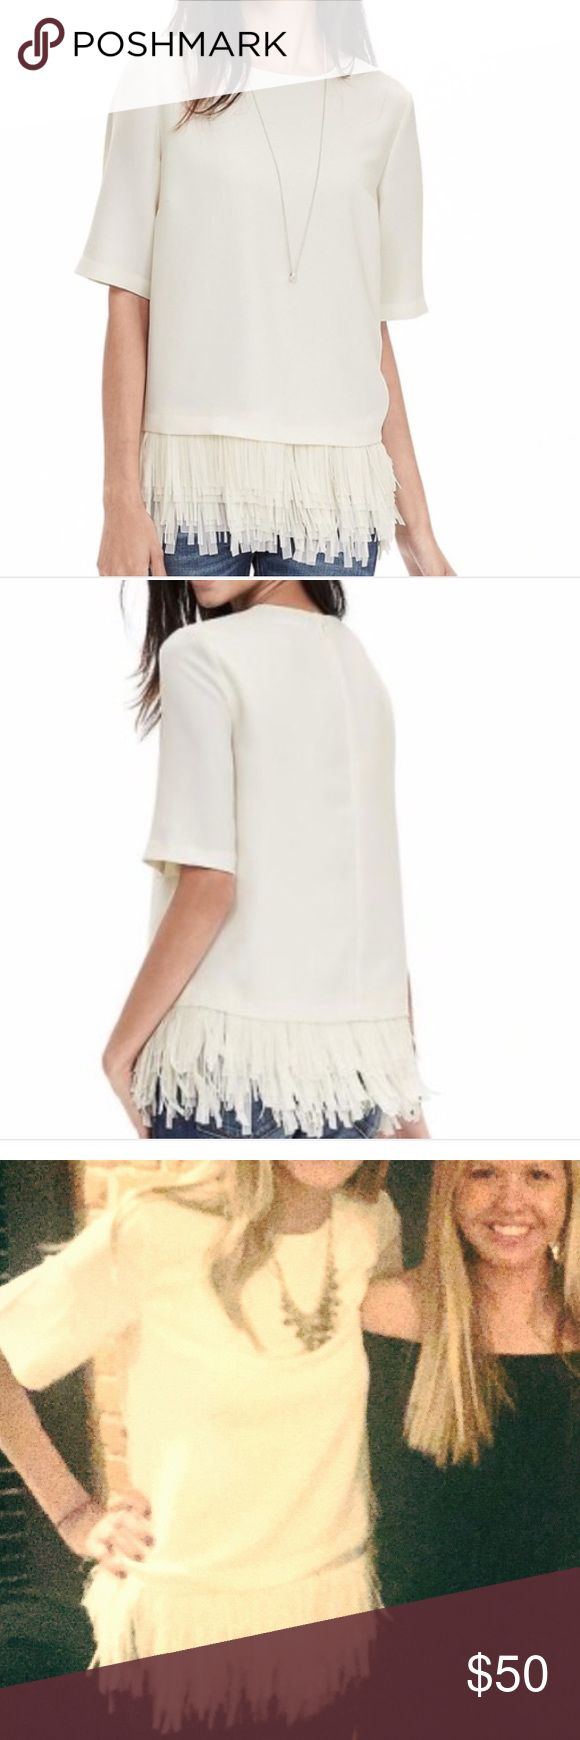 Banana Republic White Crepe Fringe Blouse The most fun shirt! Worn twice. Size small. Banana Republic Tops Blouses